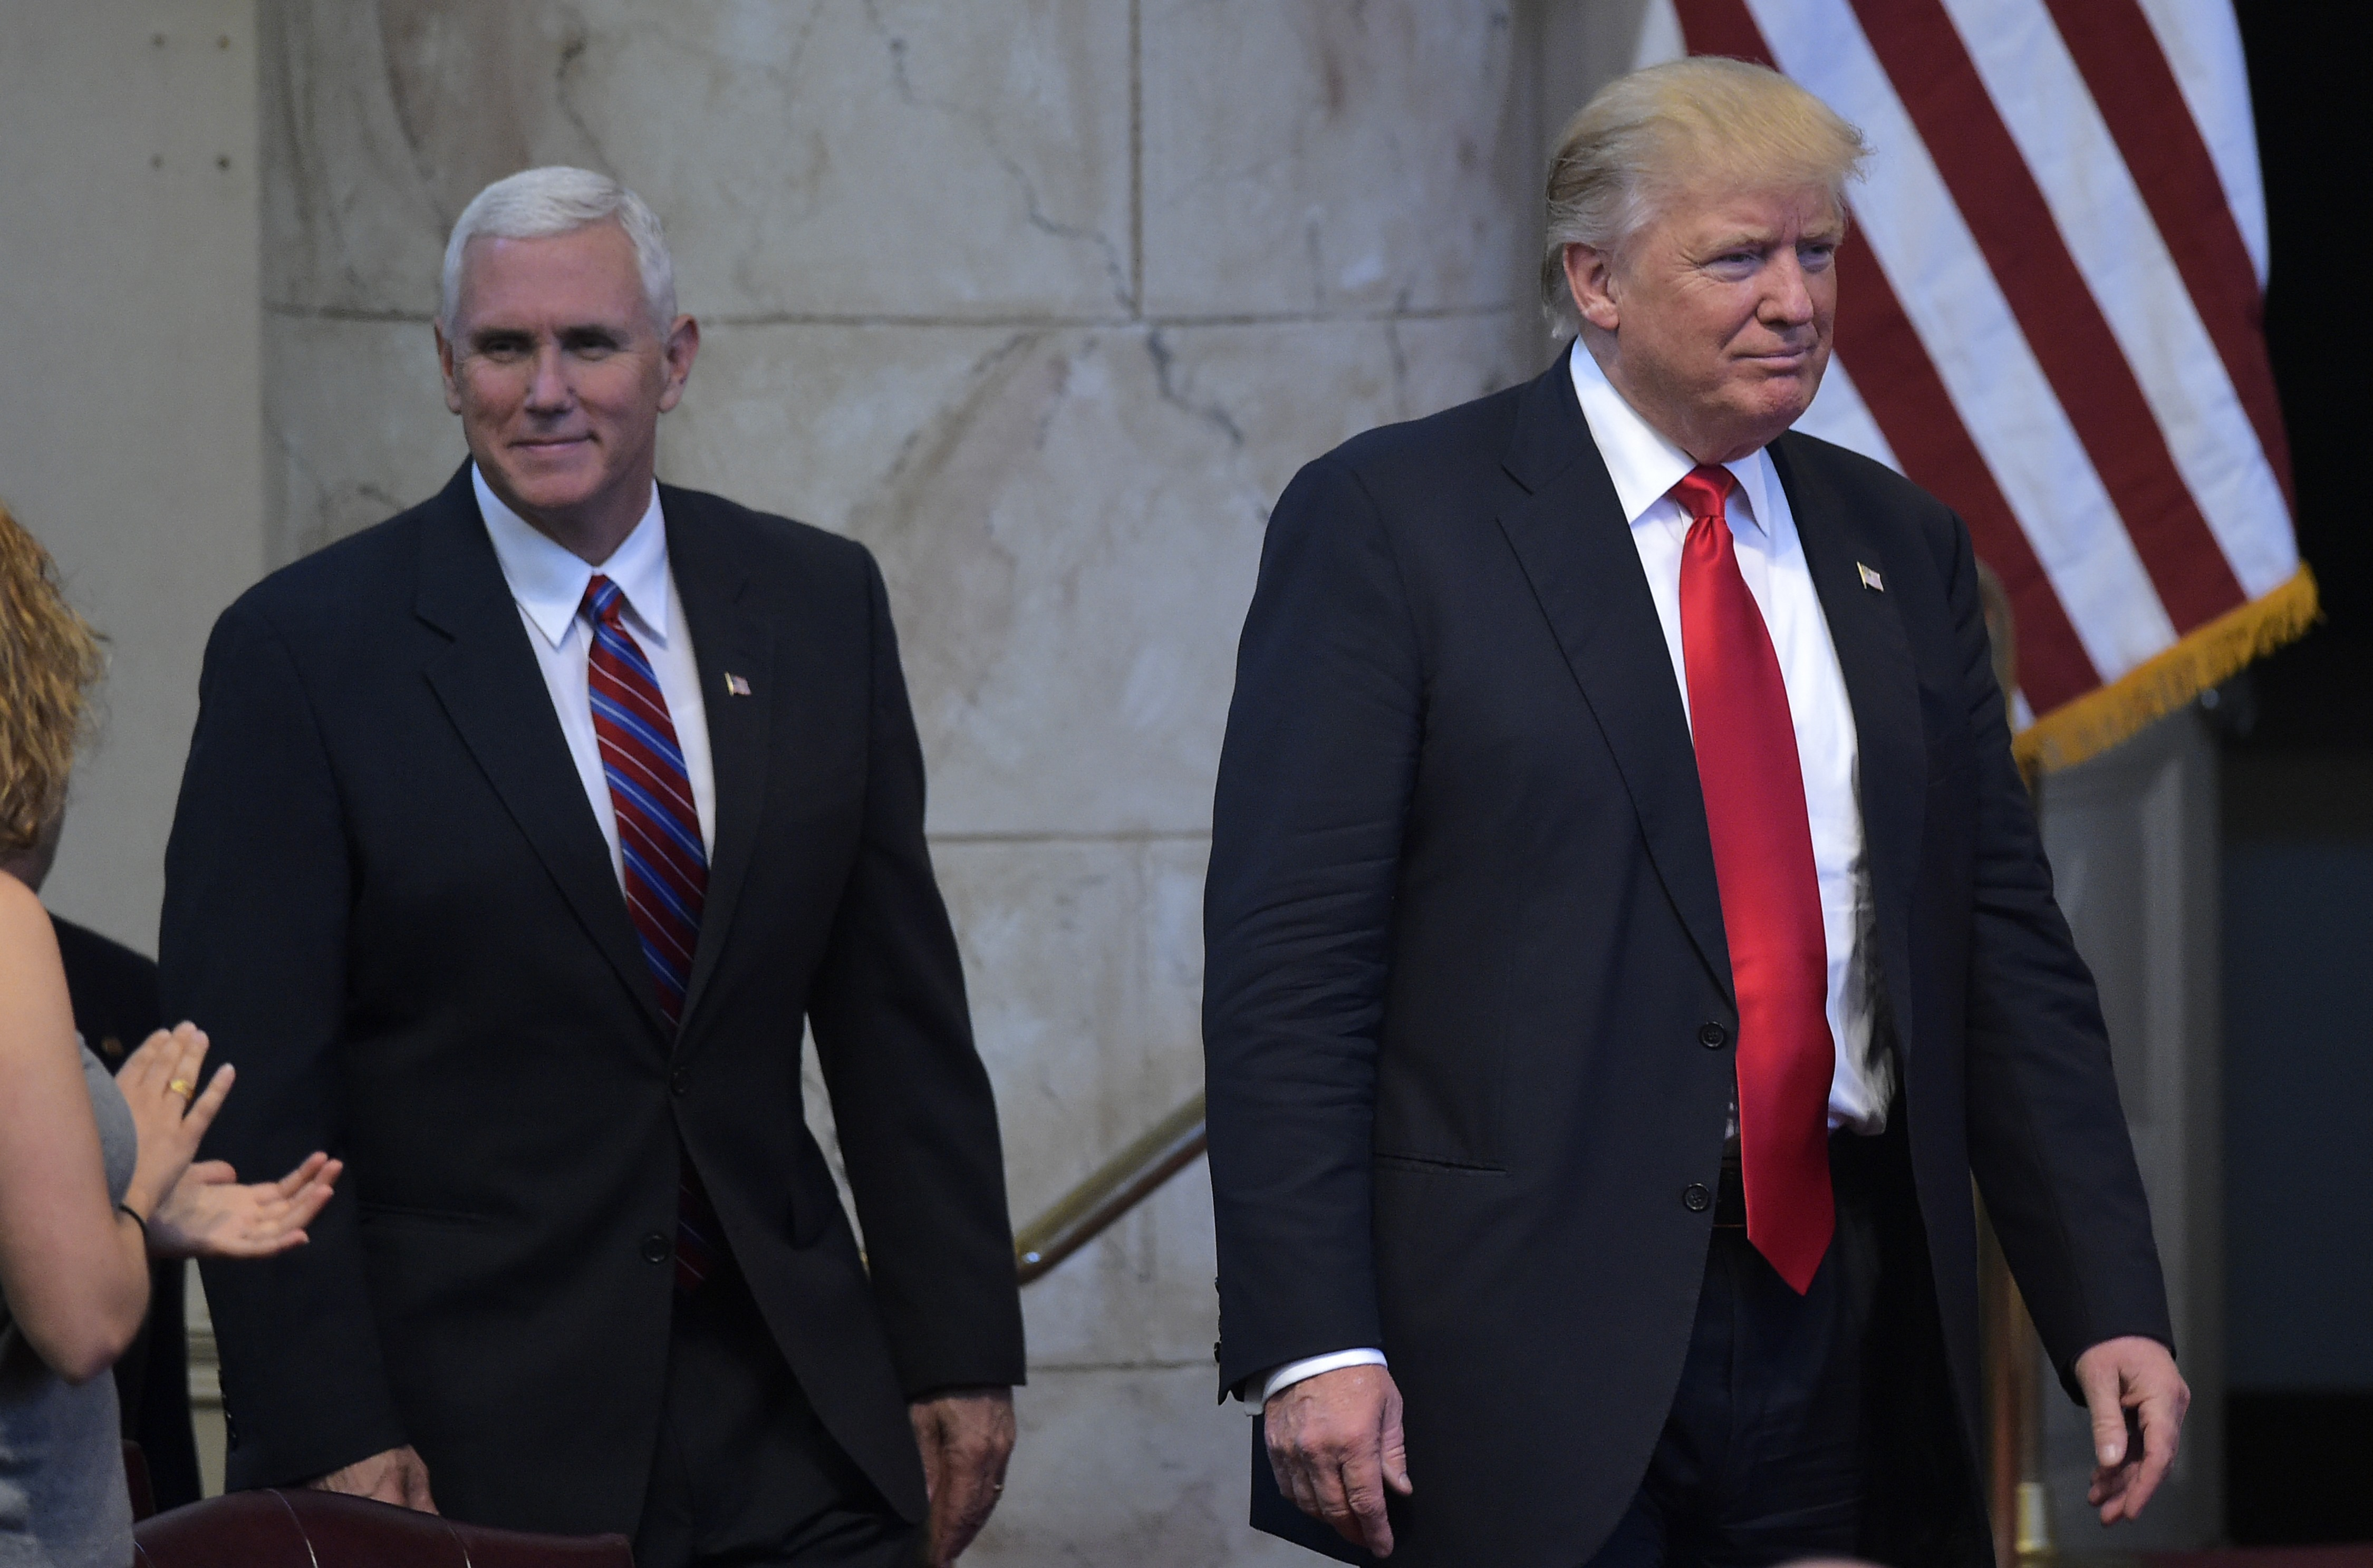 Donald Trump returns to script as contest tightens